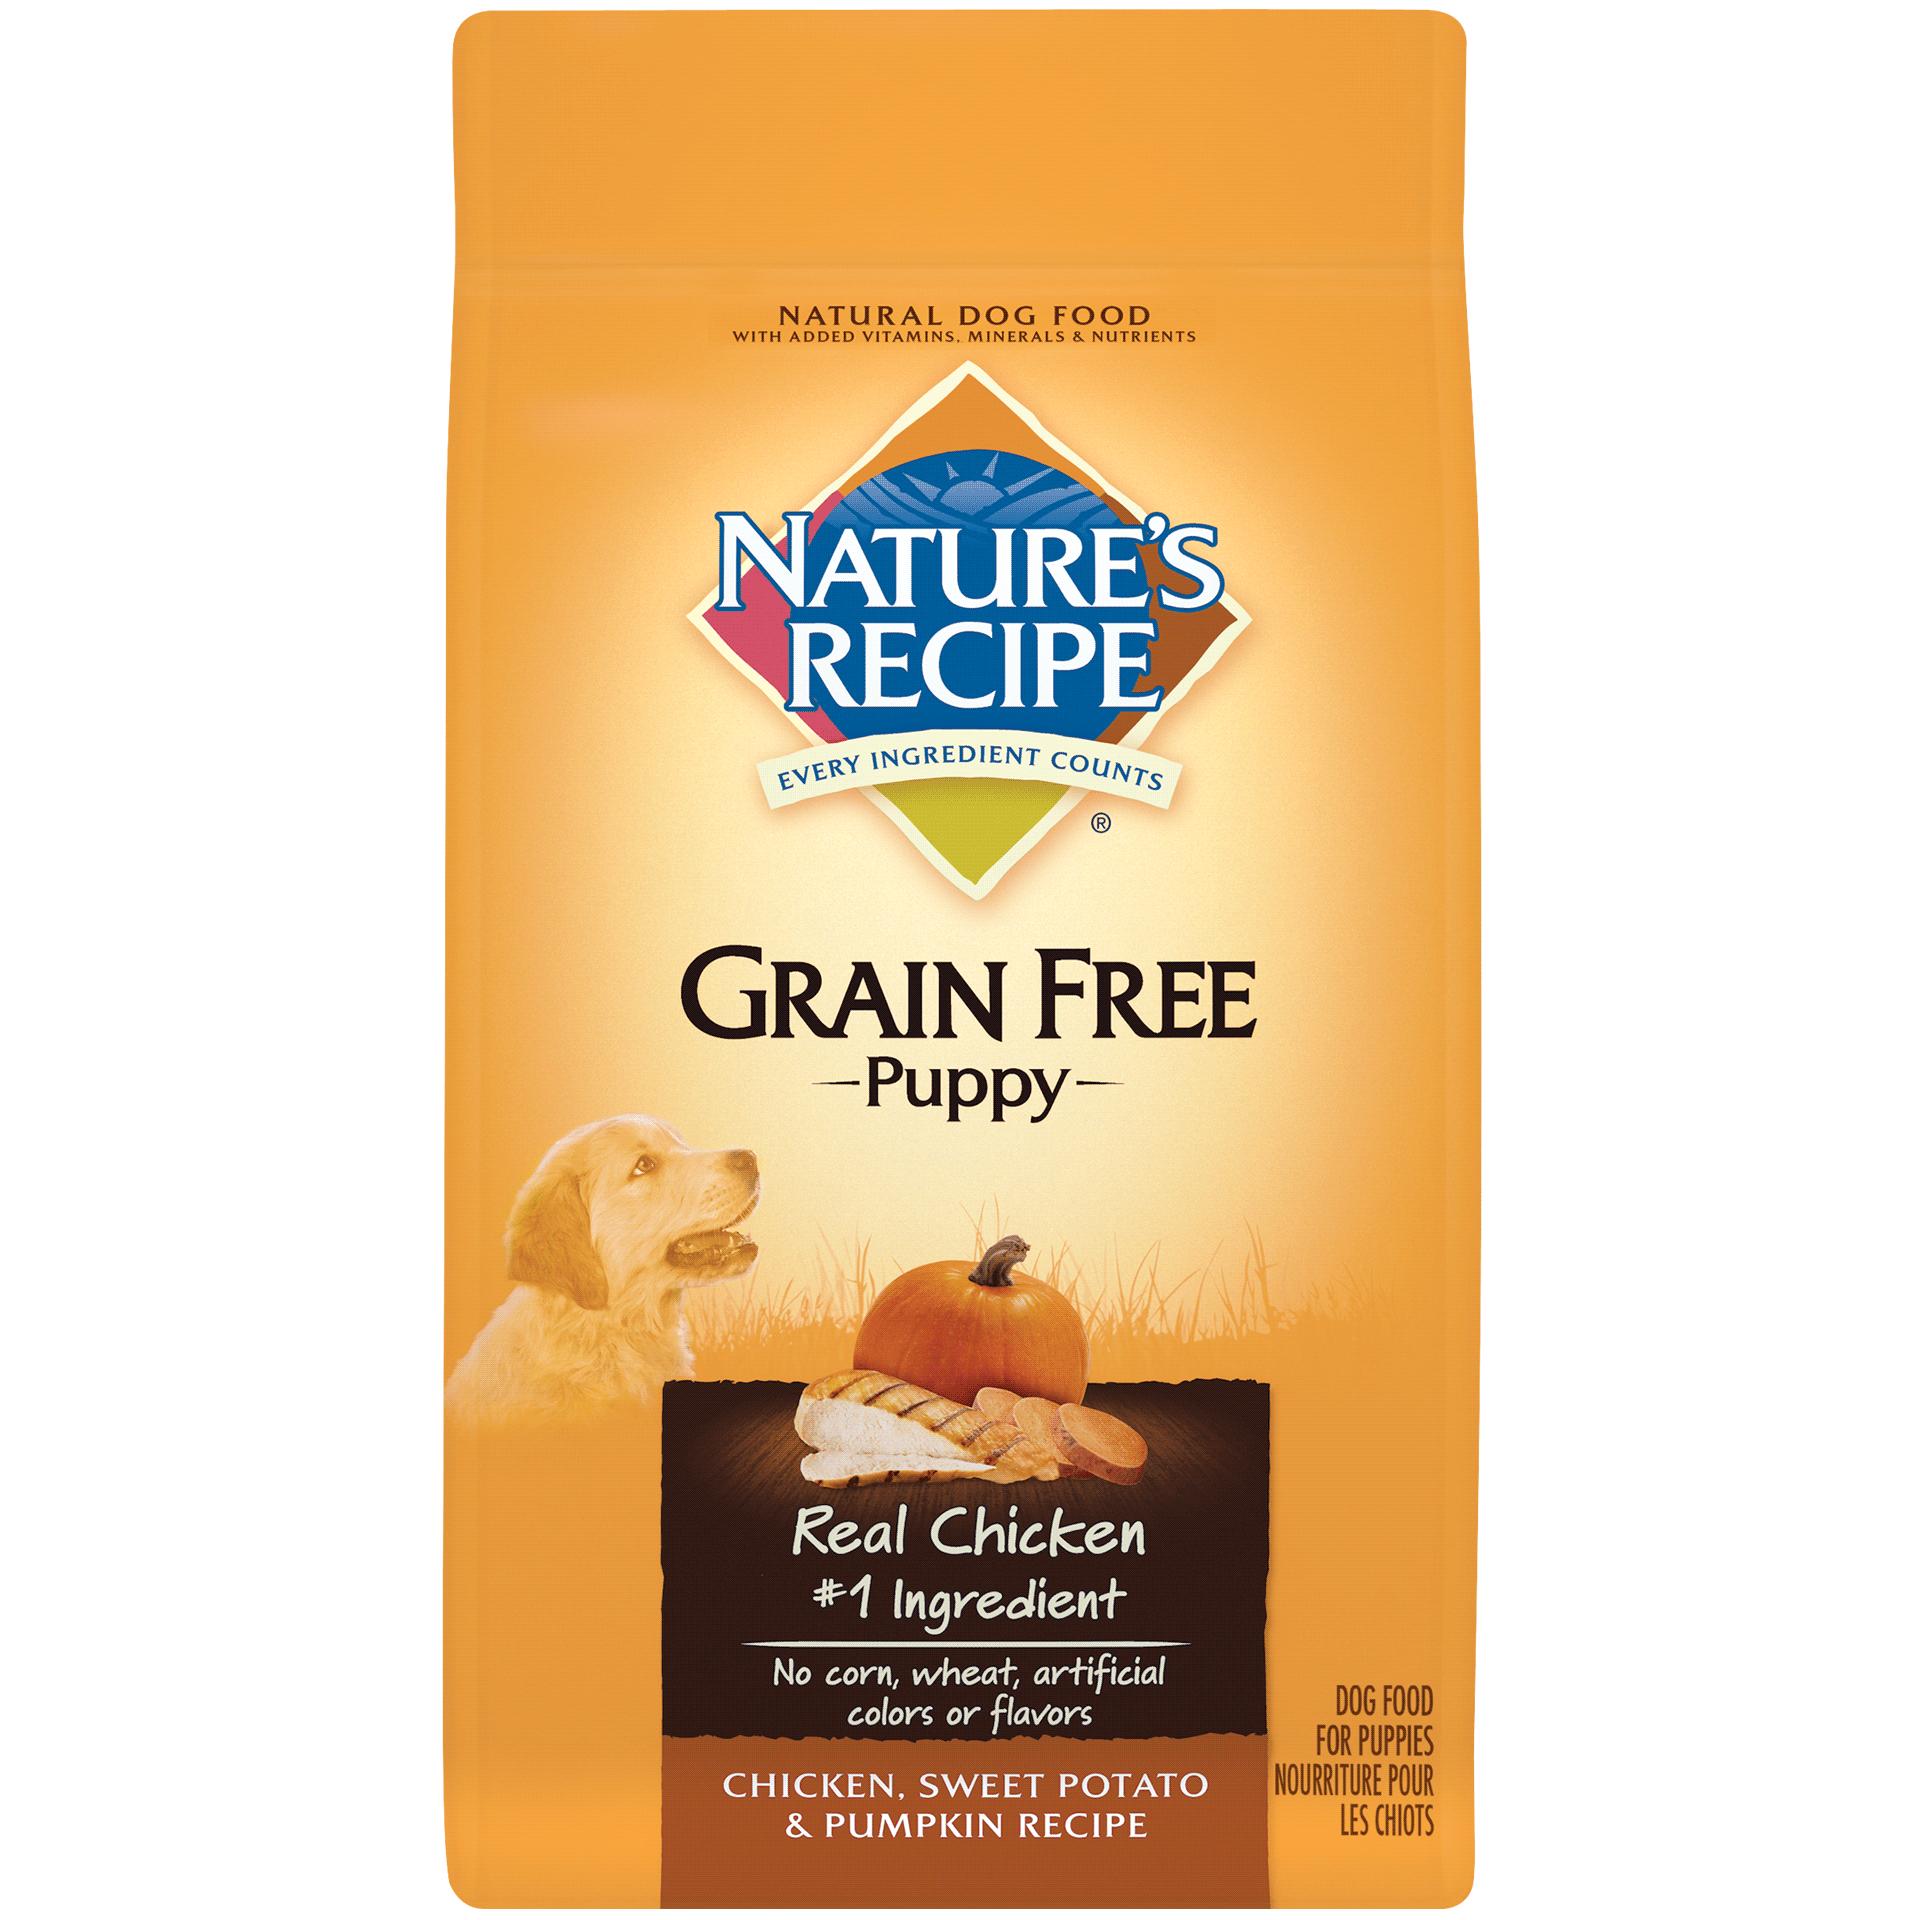 Grain Free Puppy Chicken, Sweet Potato, & Pumpkin Recipe